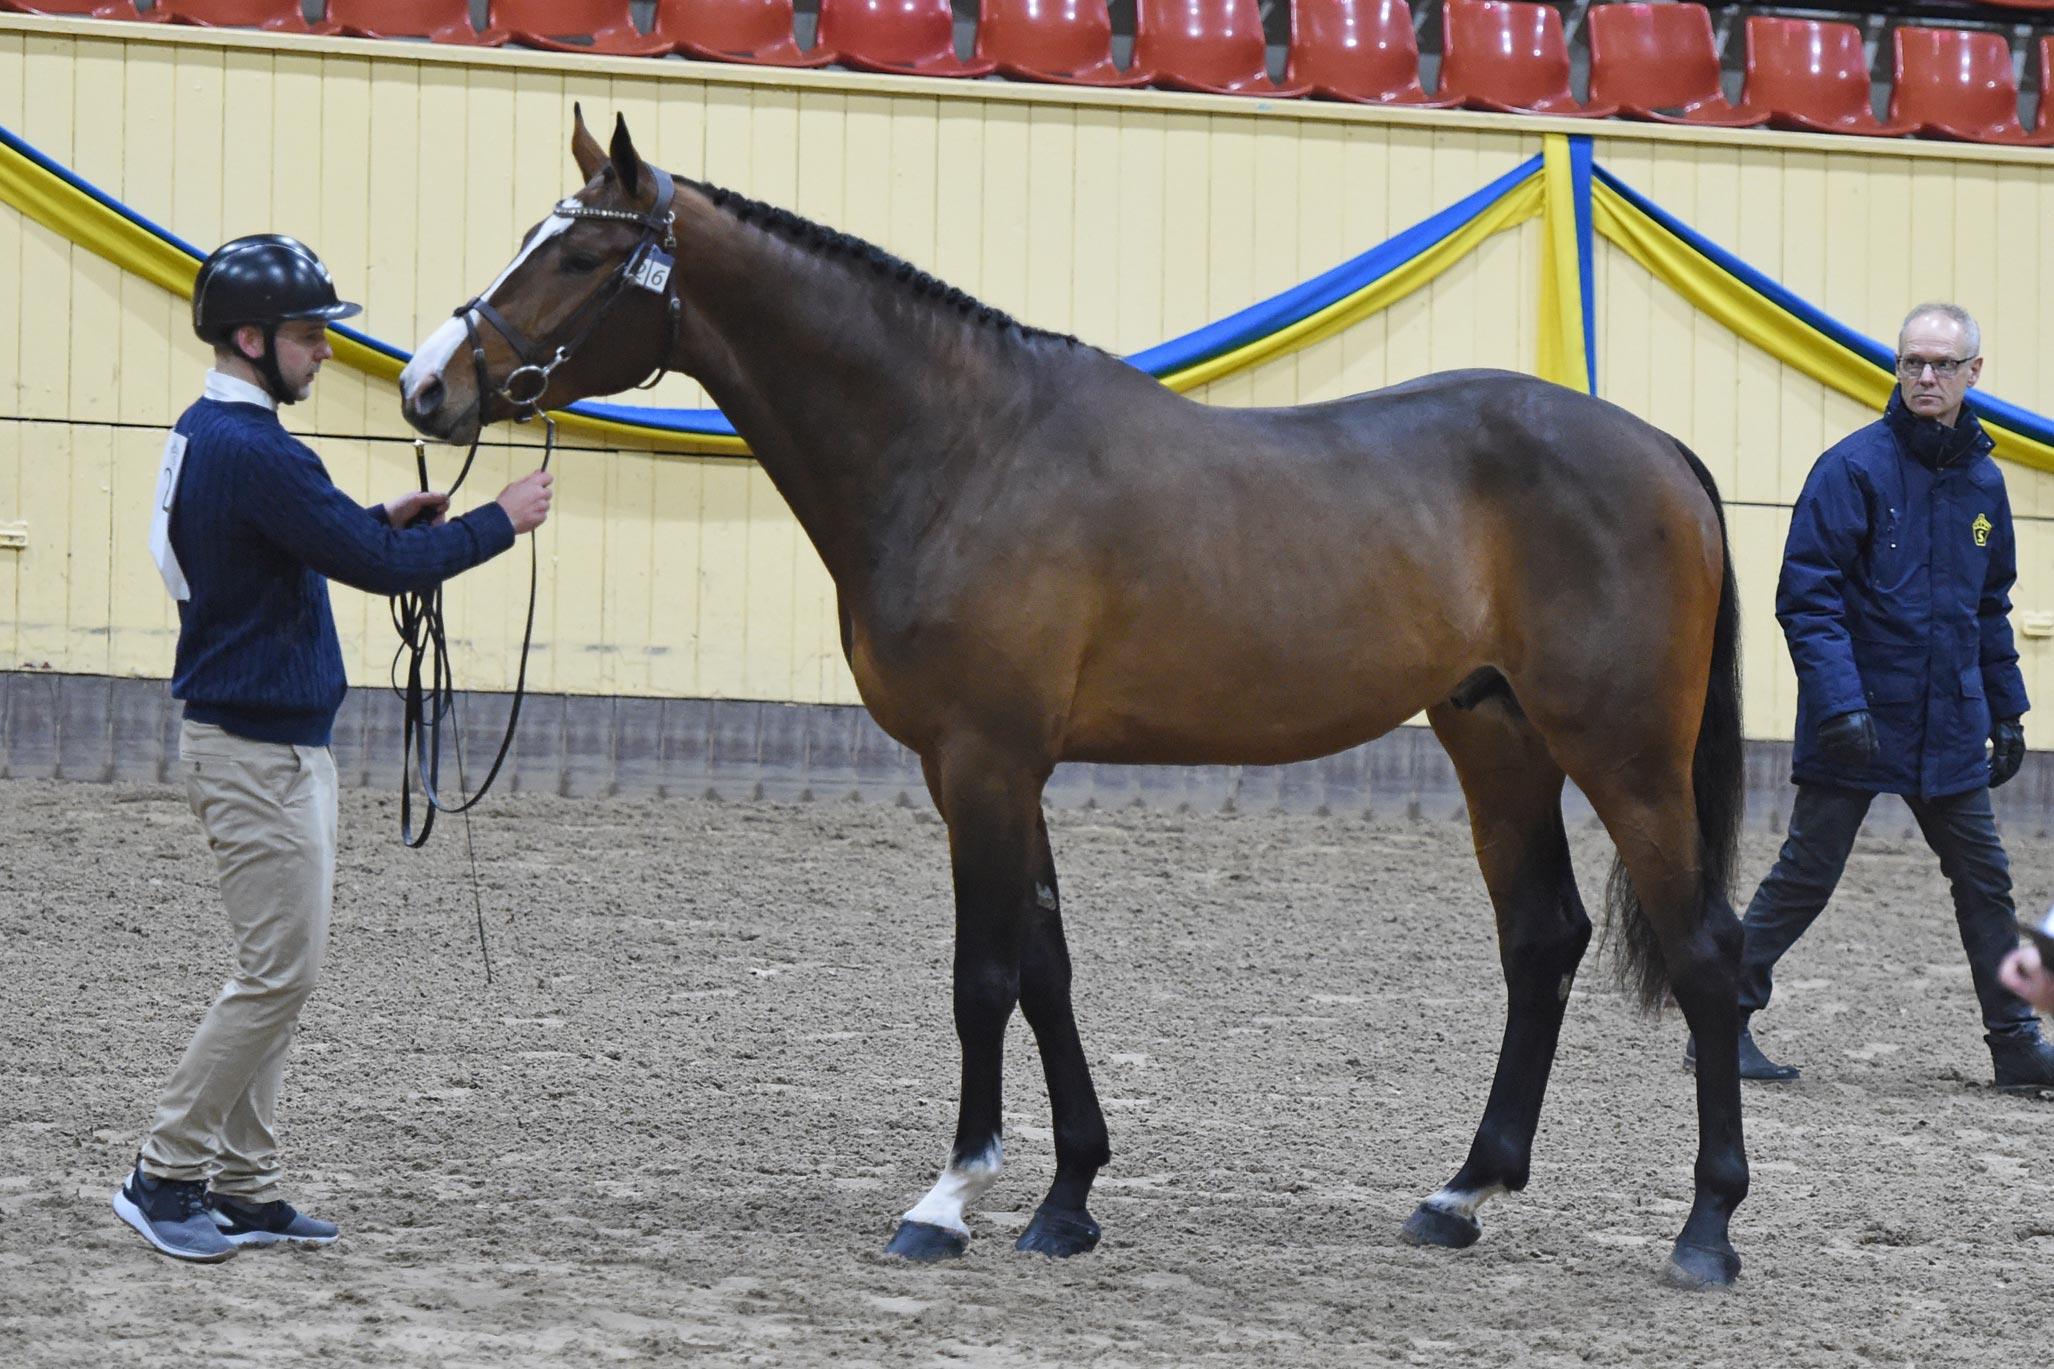 Kjaton VL KWPN 170 cm e Cardento u Balanda Z e Baloubet du Rouet-Quito de Baussy. Uppf B. van Leur. Ägare: Li Krog. Ryttare: Shane Carey.